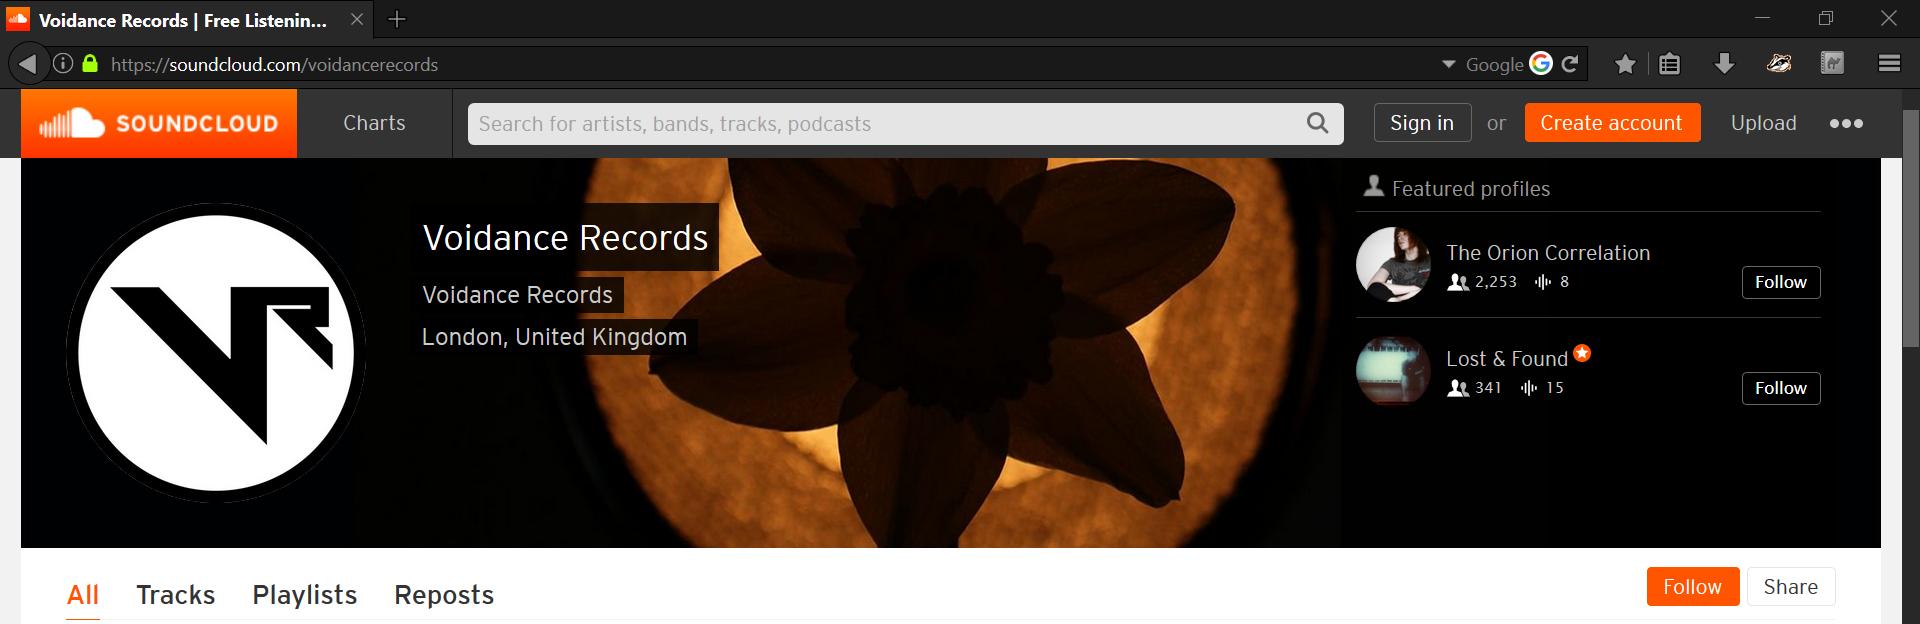 SoundCloud Featured Profiles